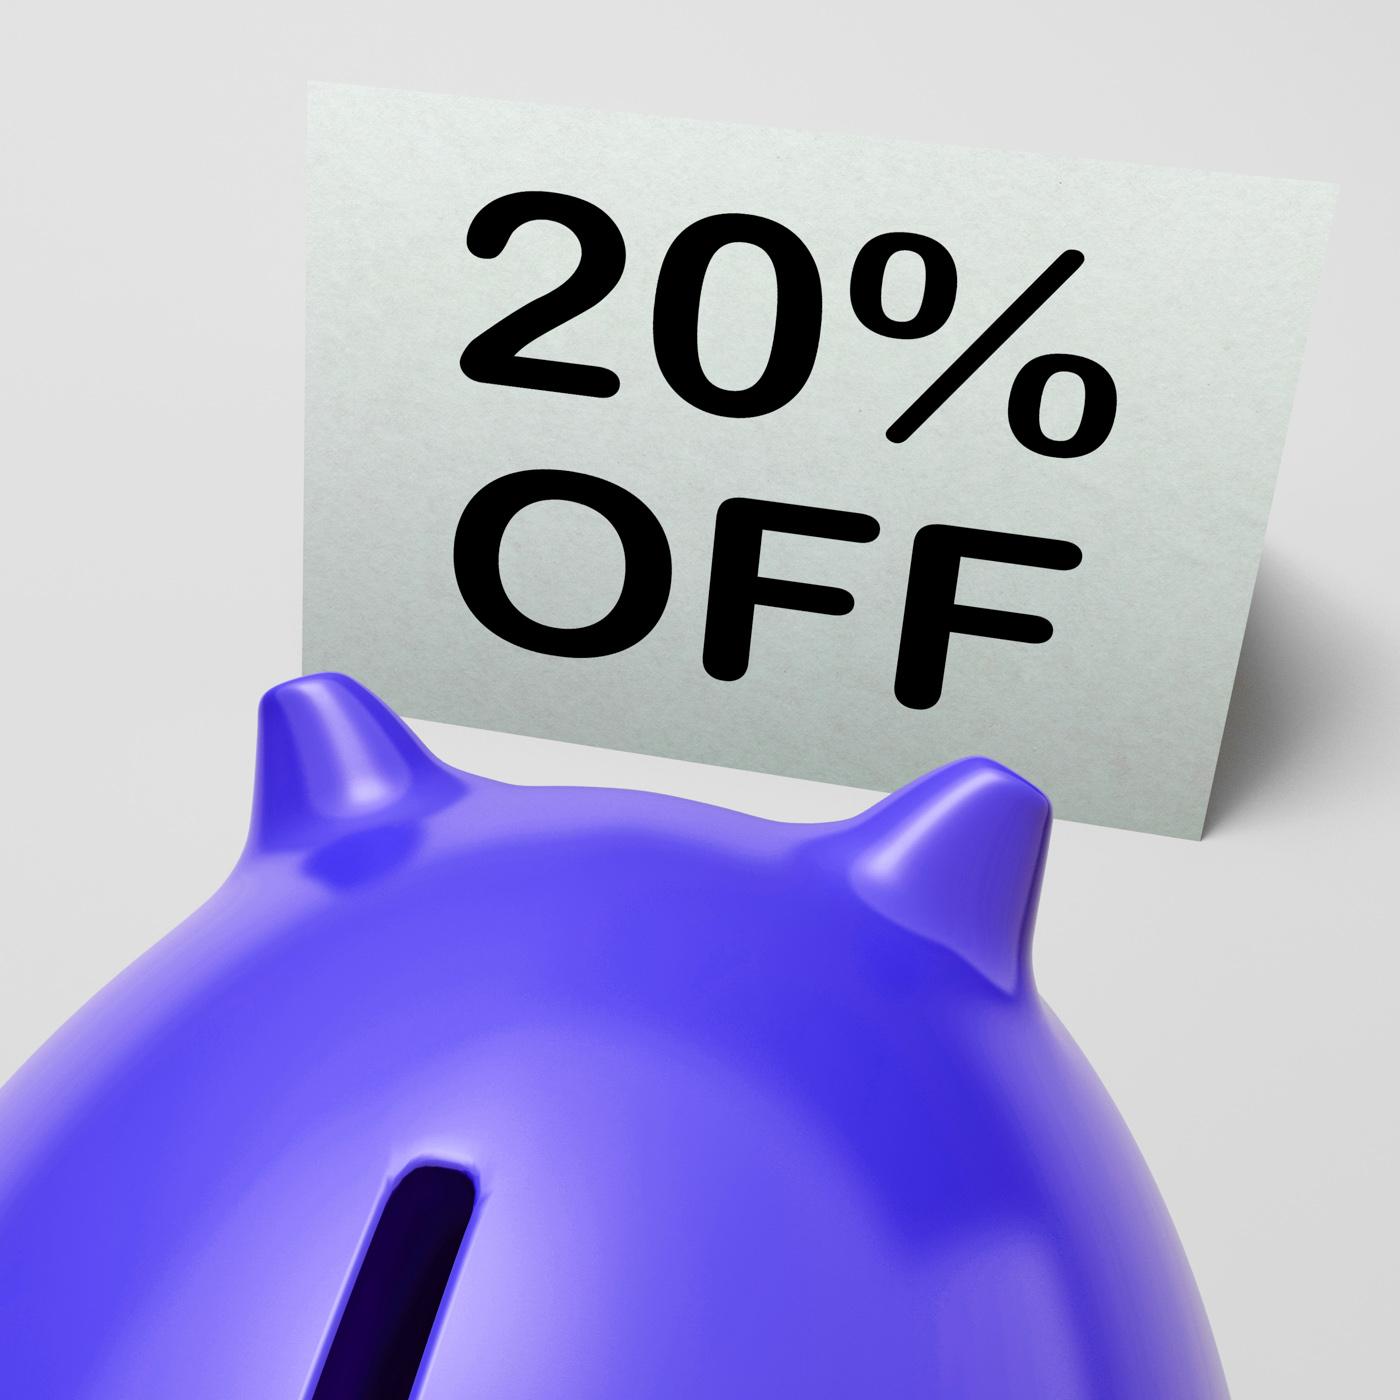 Twenty percent off piggy bank means discounted 20 photo